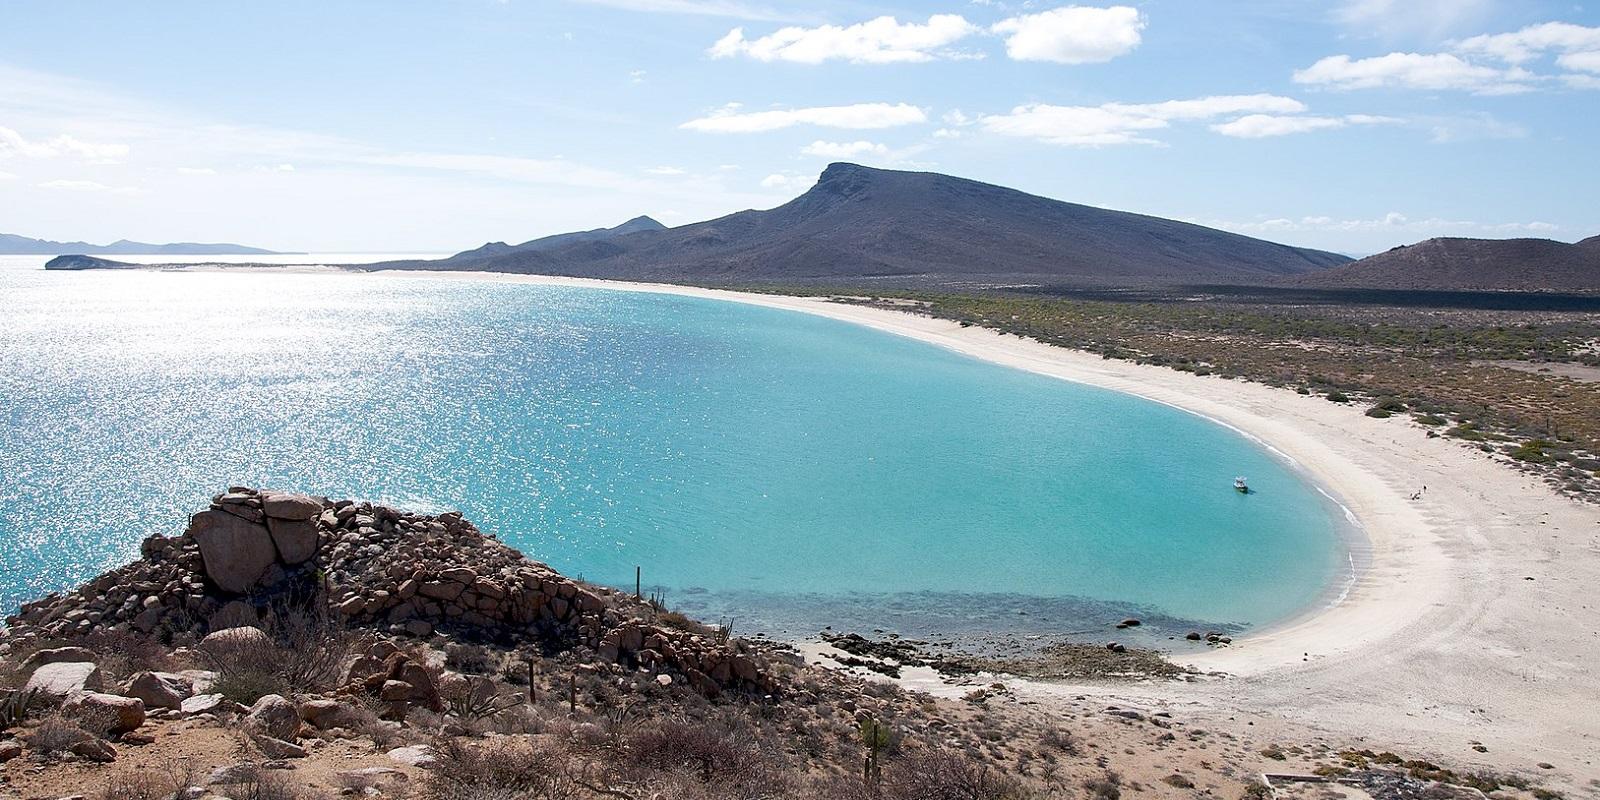 La spiaggia dell'isola Espiritu Santu